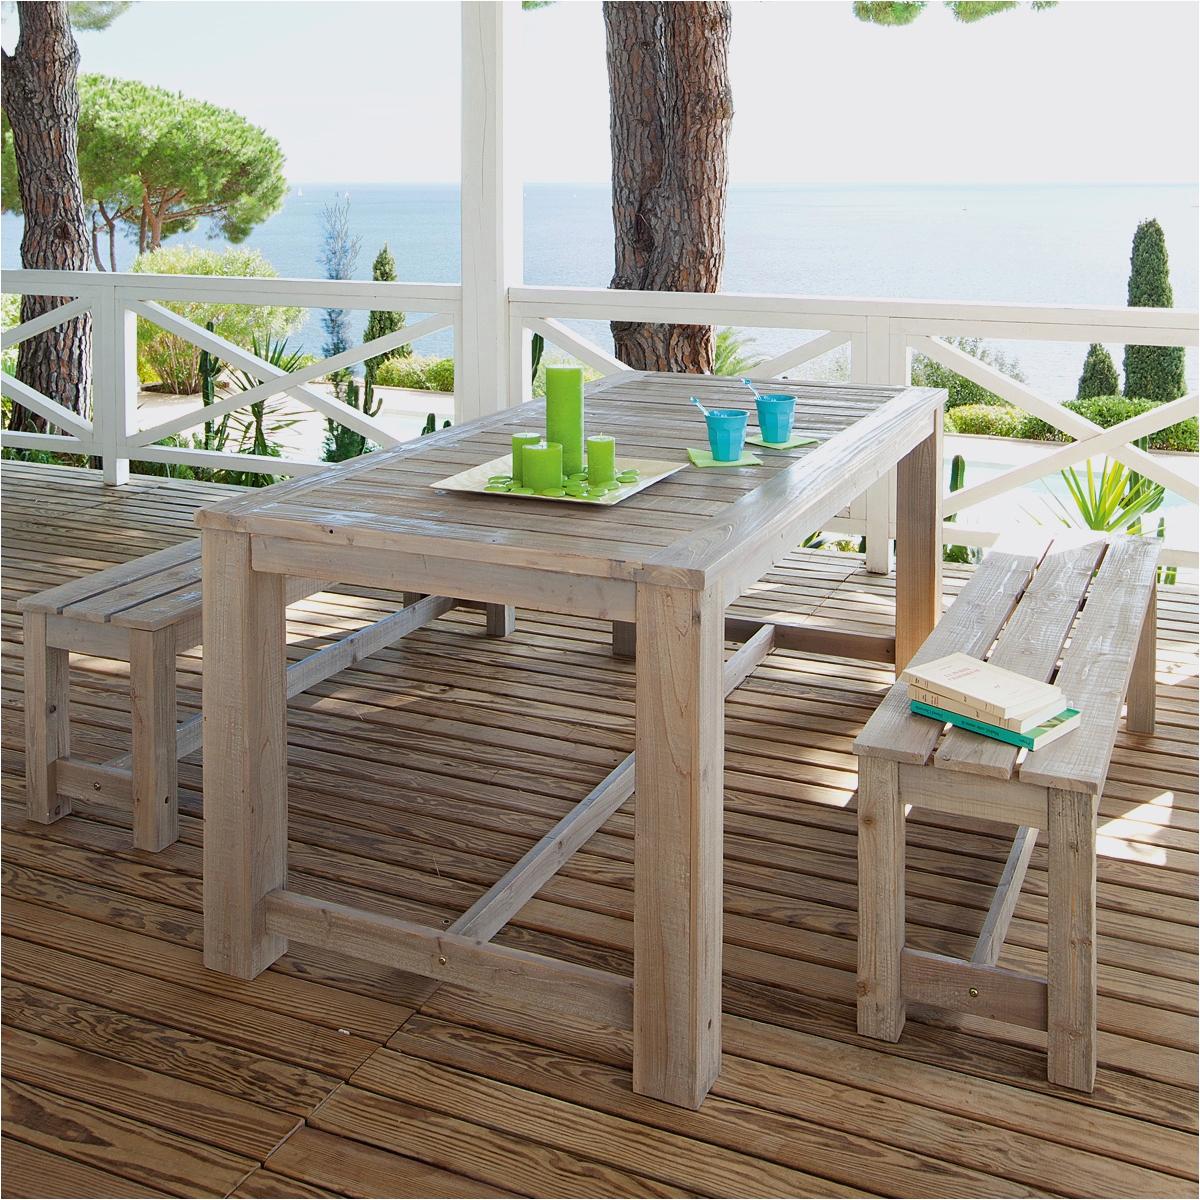 Table De Jardin Intermarche Nouveau Stock 35 Inspirational Pics Intermarché Salon De Jardin 35 Inspirant